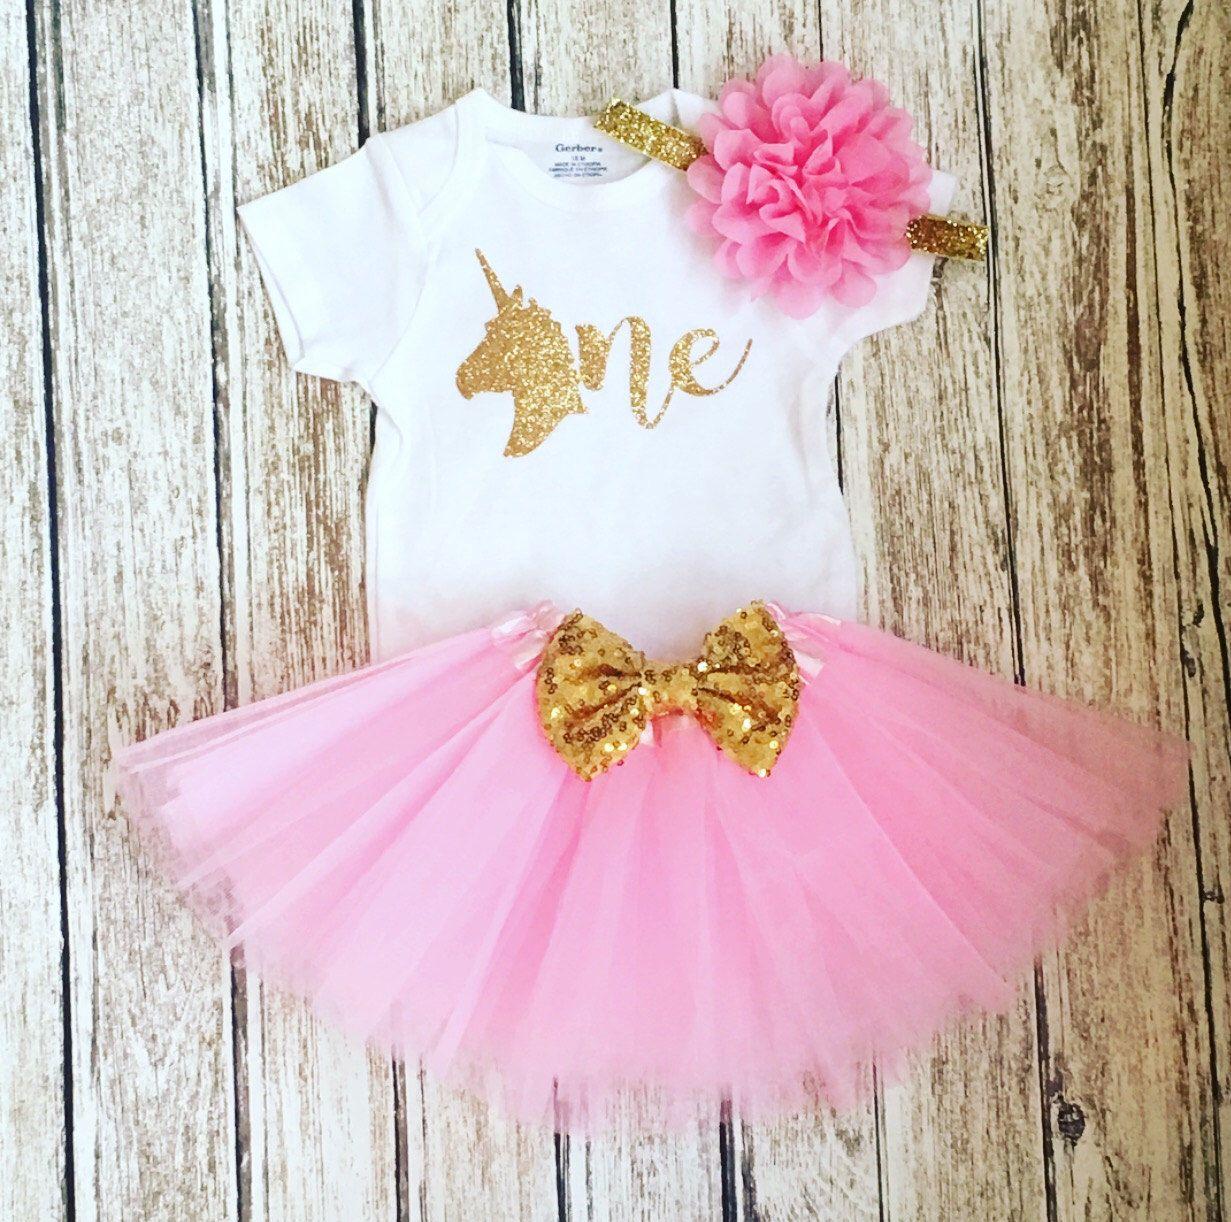 Girls First Birthday Outfit Pink Gold Unicorn theme birthday